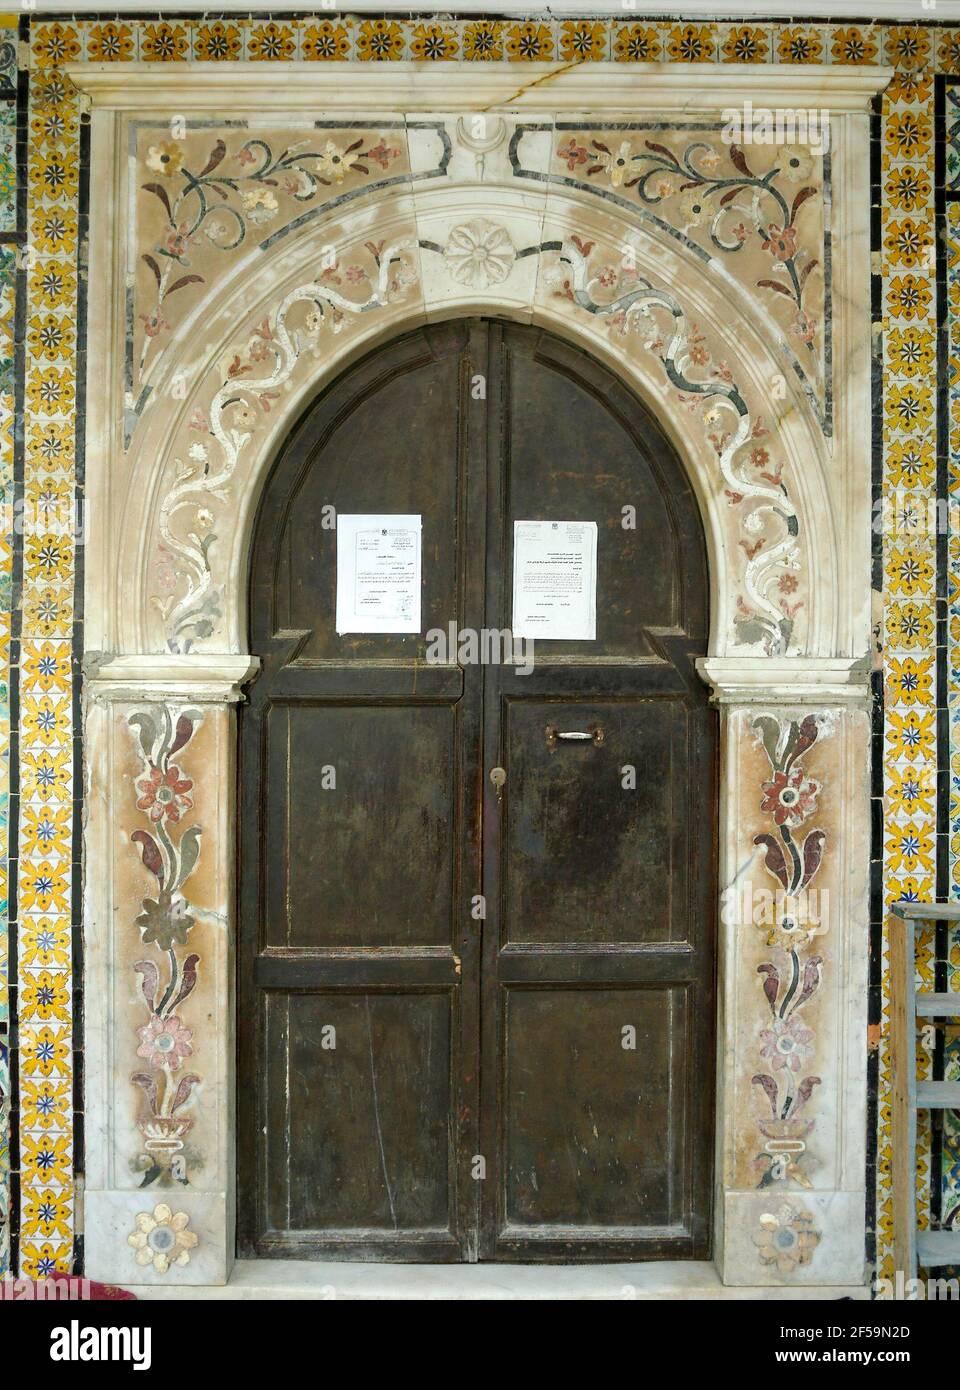 Bogeneingang, Gurgi-Moschee, Tripolis, Libyen Stockfoto